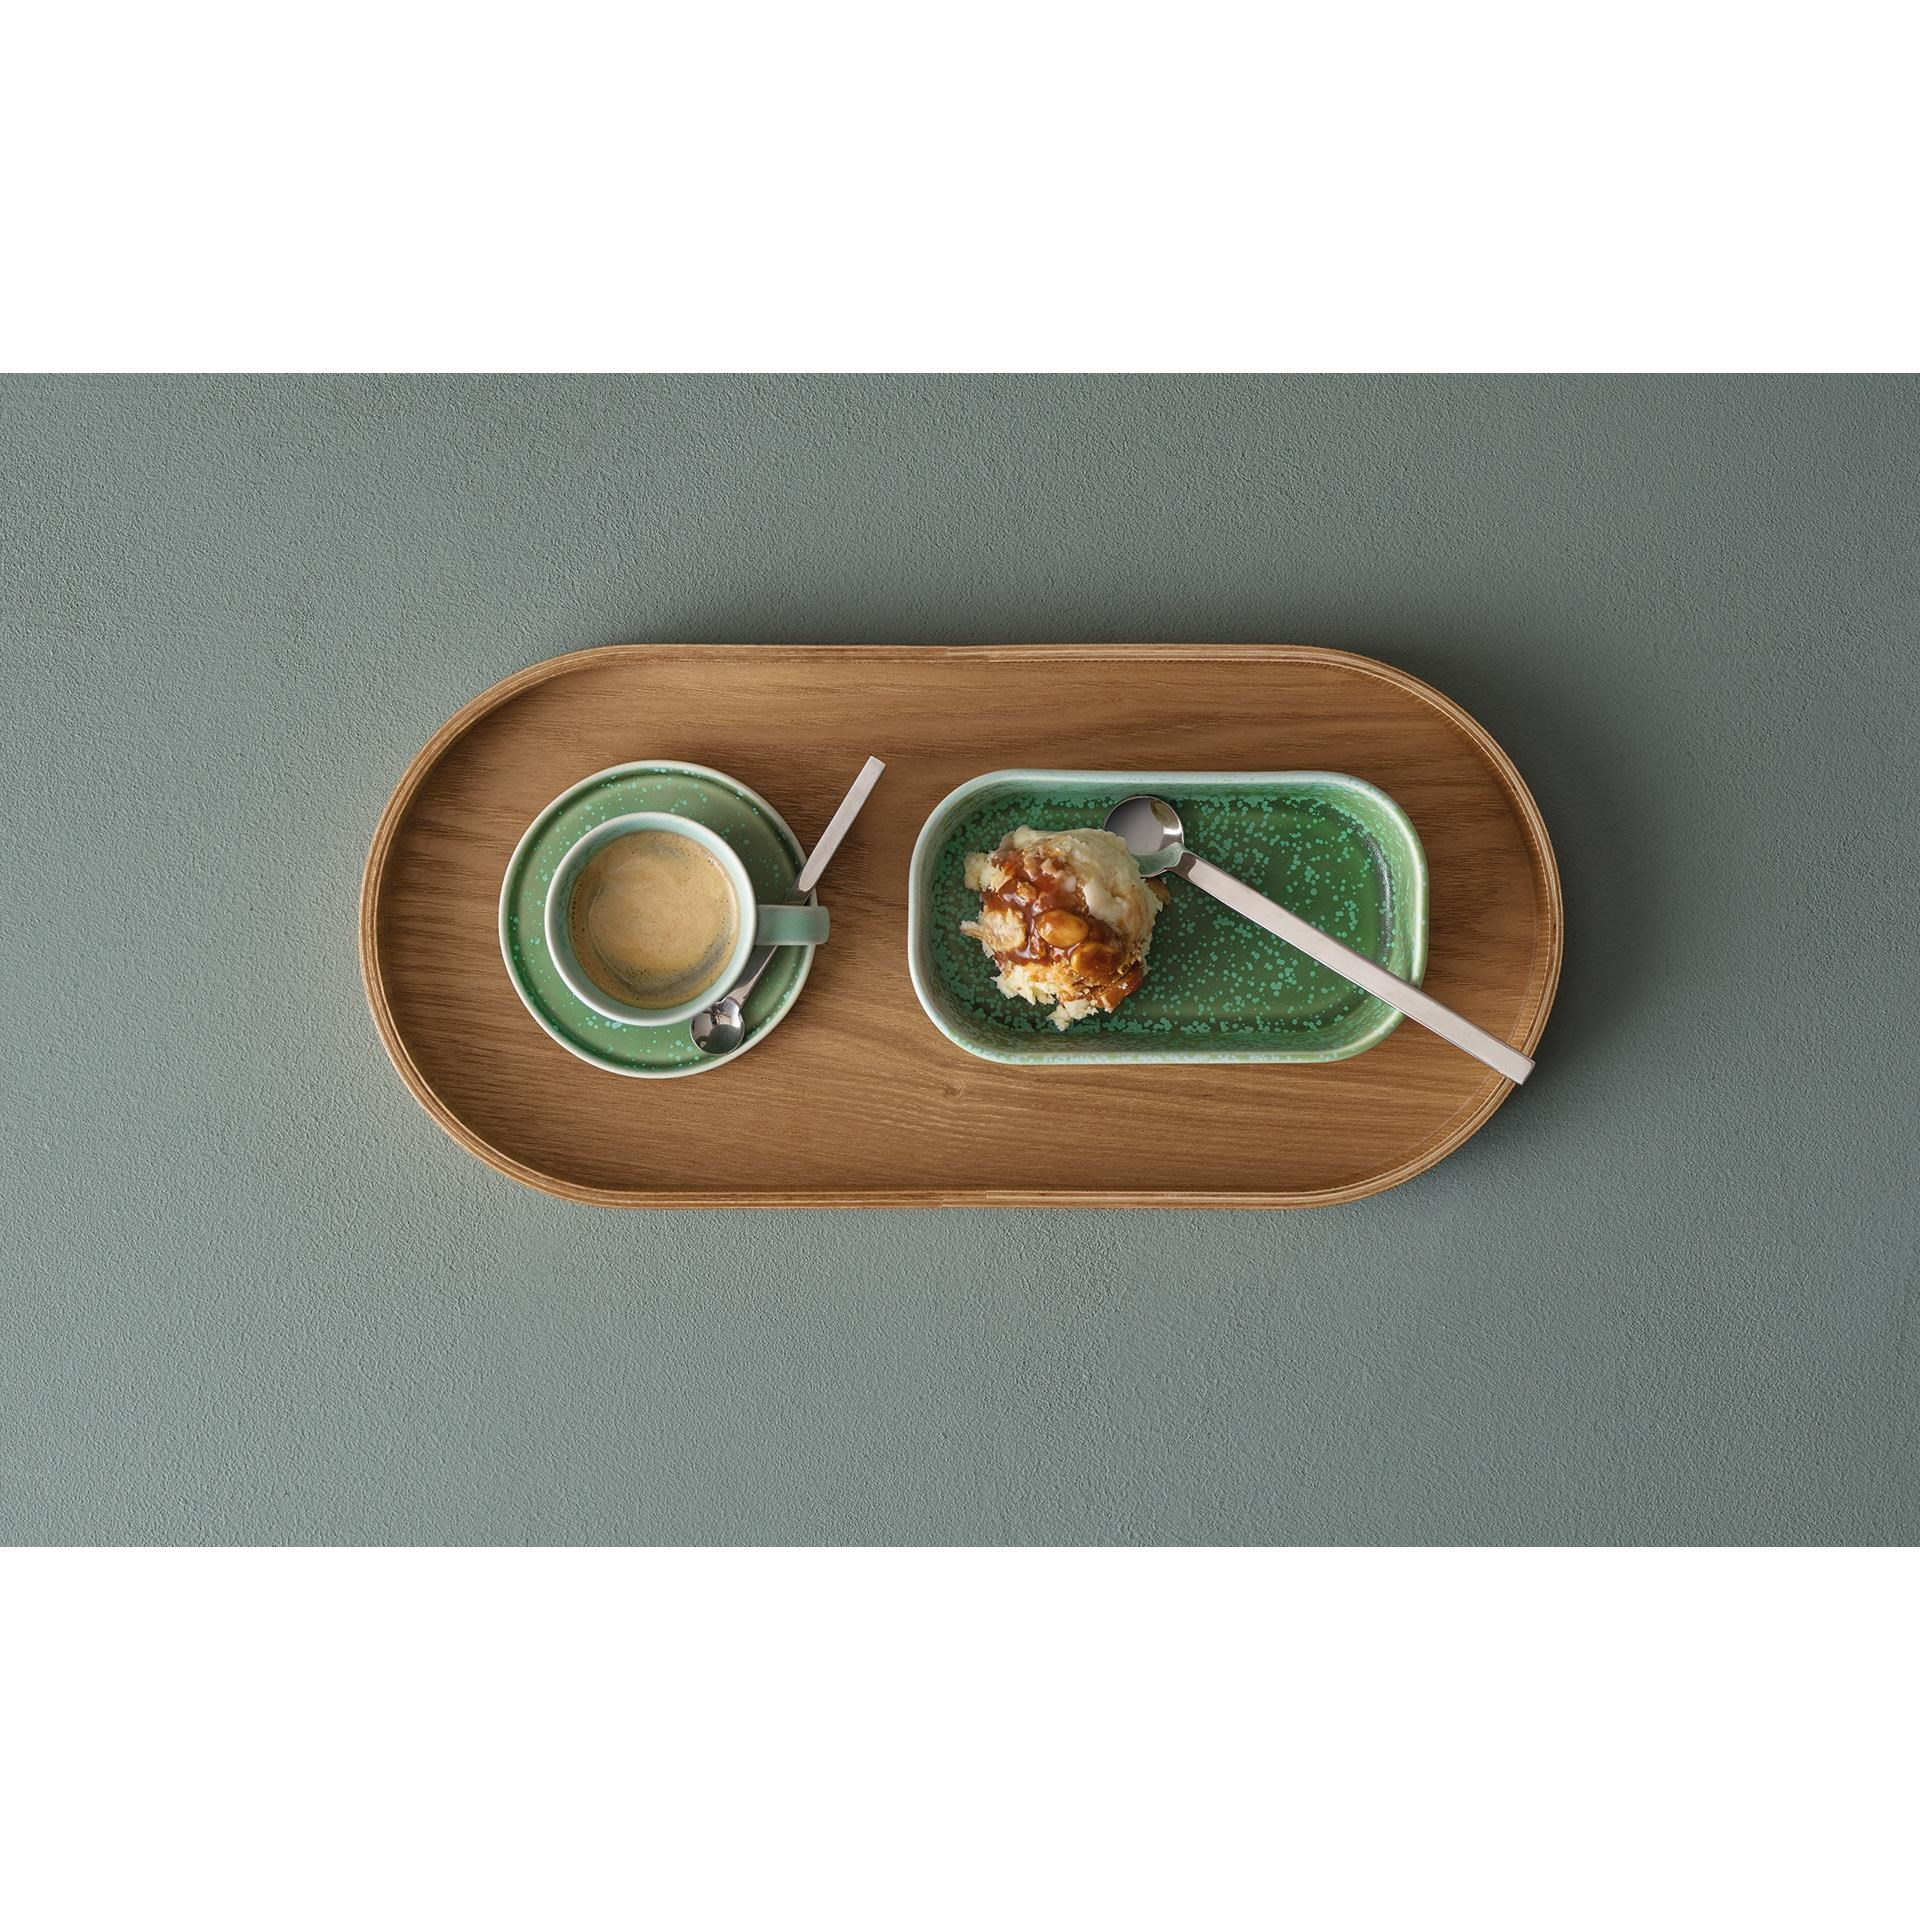 Dřevěný tác SONOKO oválný 44x22,5 cm_2